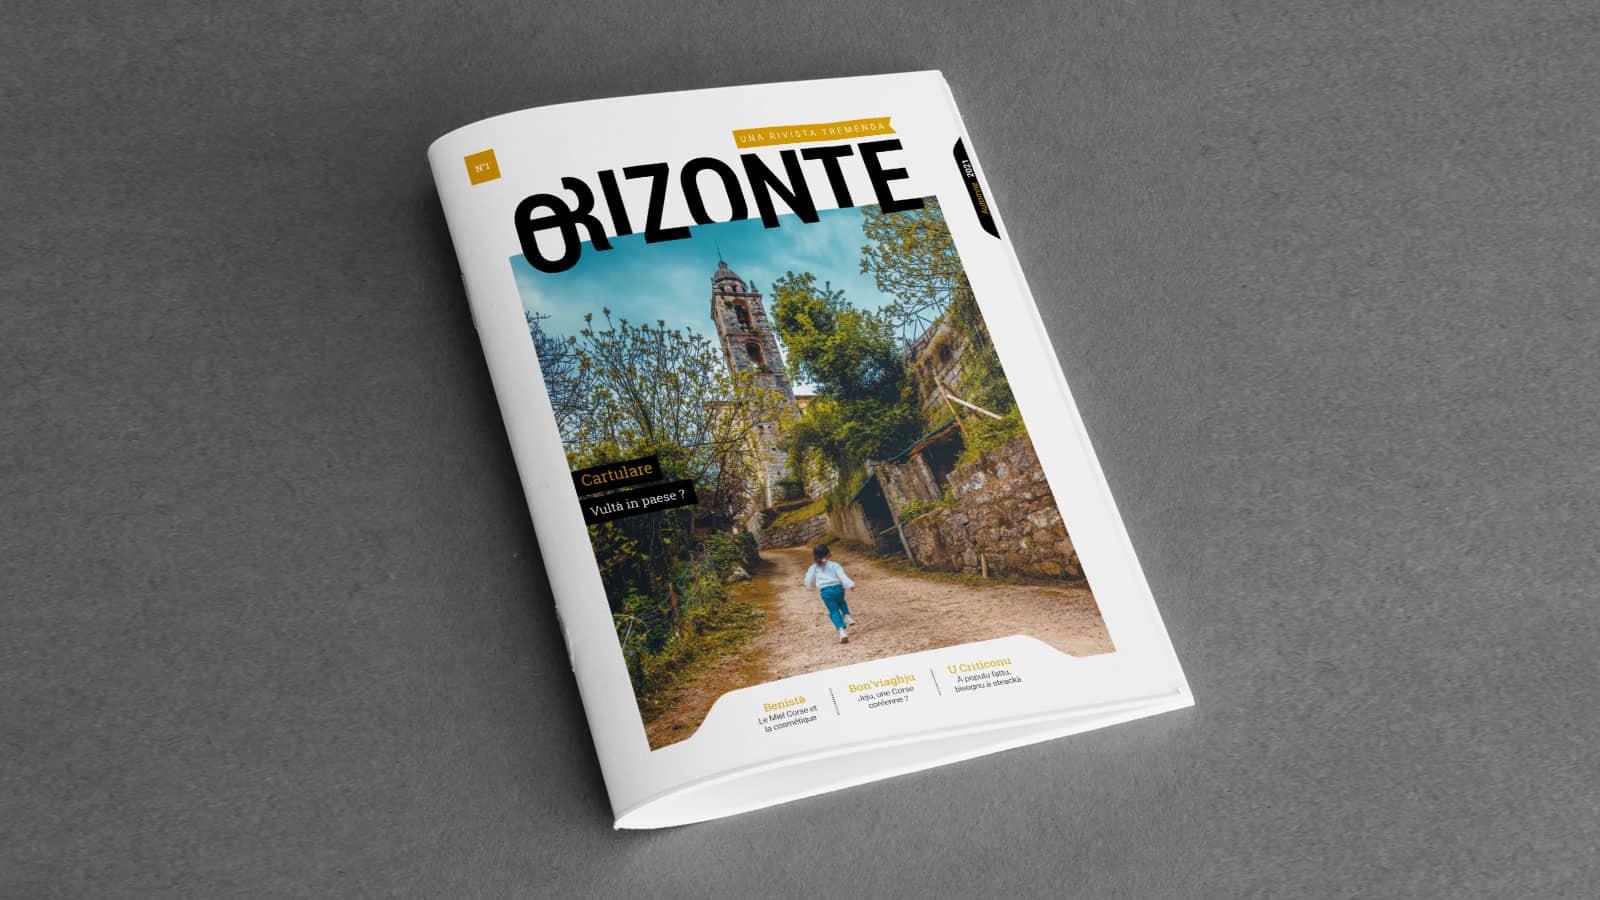 Introducing our magazine Orizonte